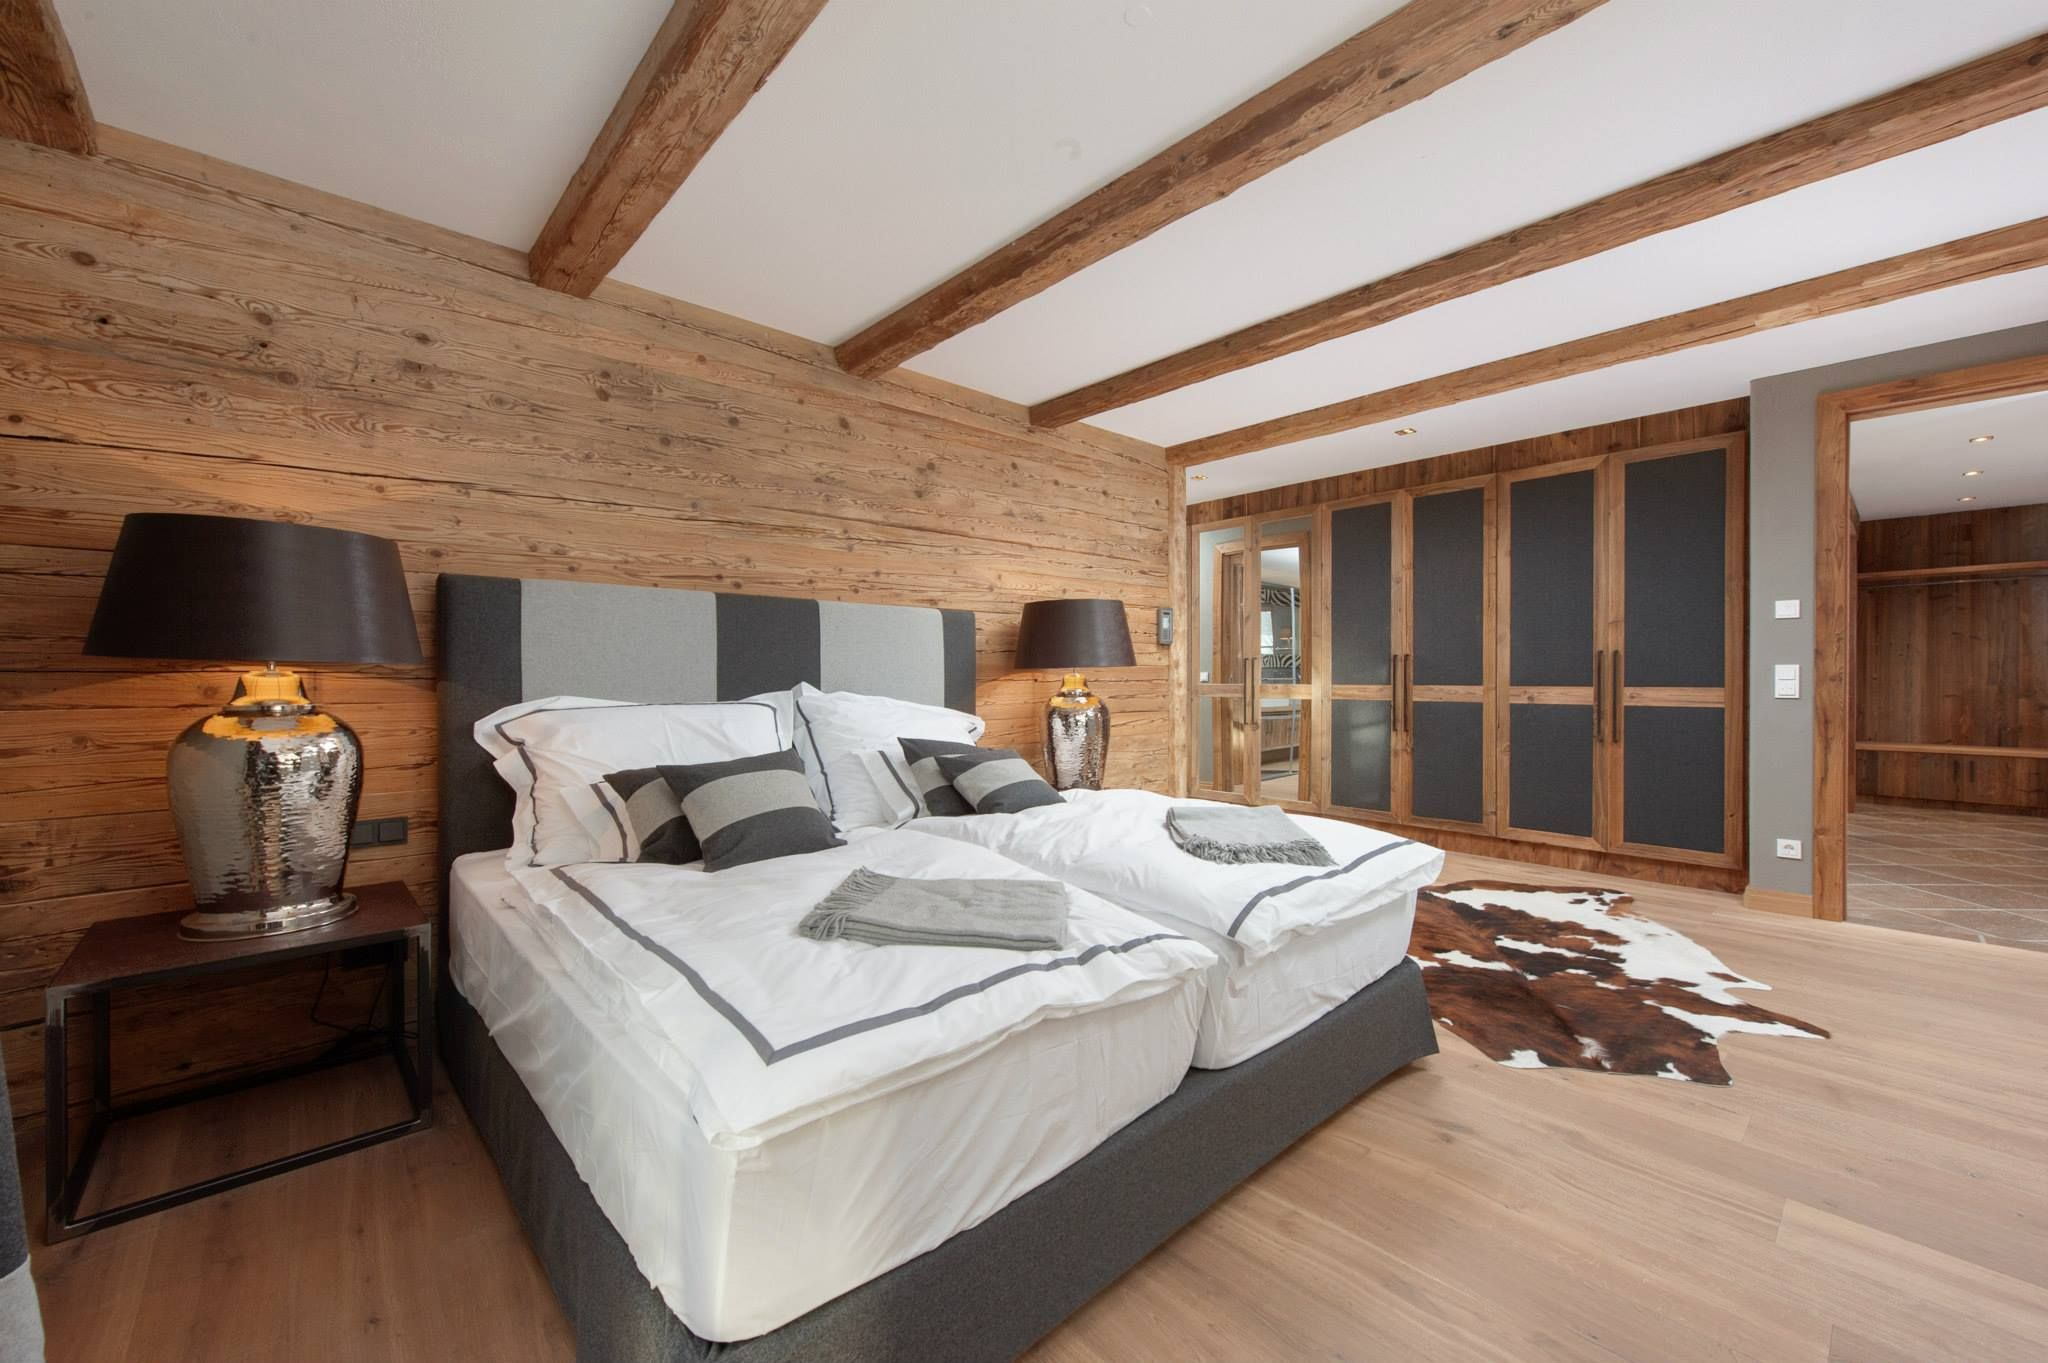 Alpen charlet holz schlafzimmer inneneinrichtung und villa - Inneneinrichtung schlafzimmer ...